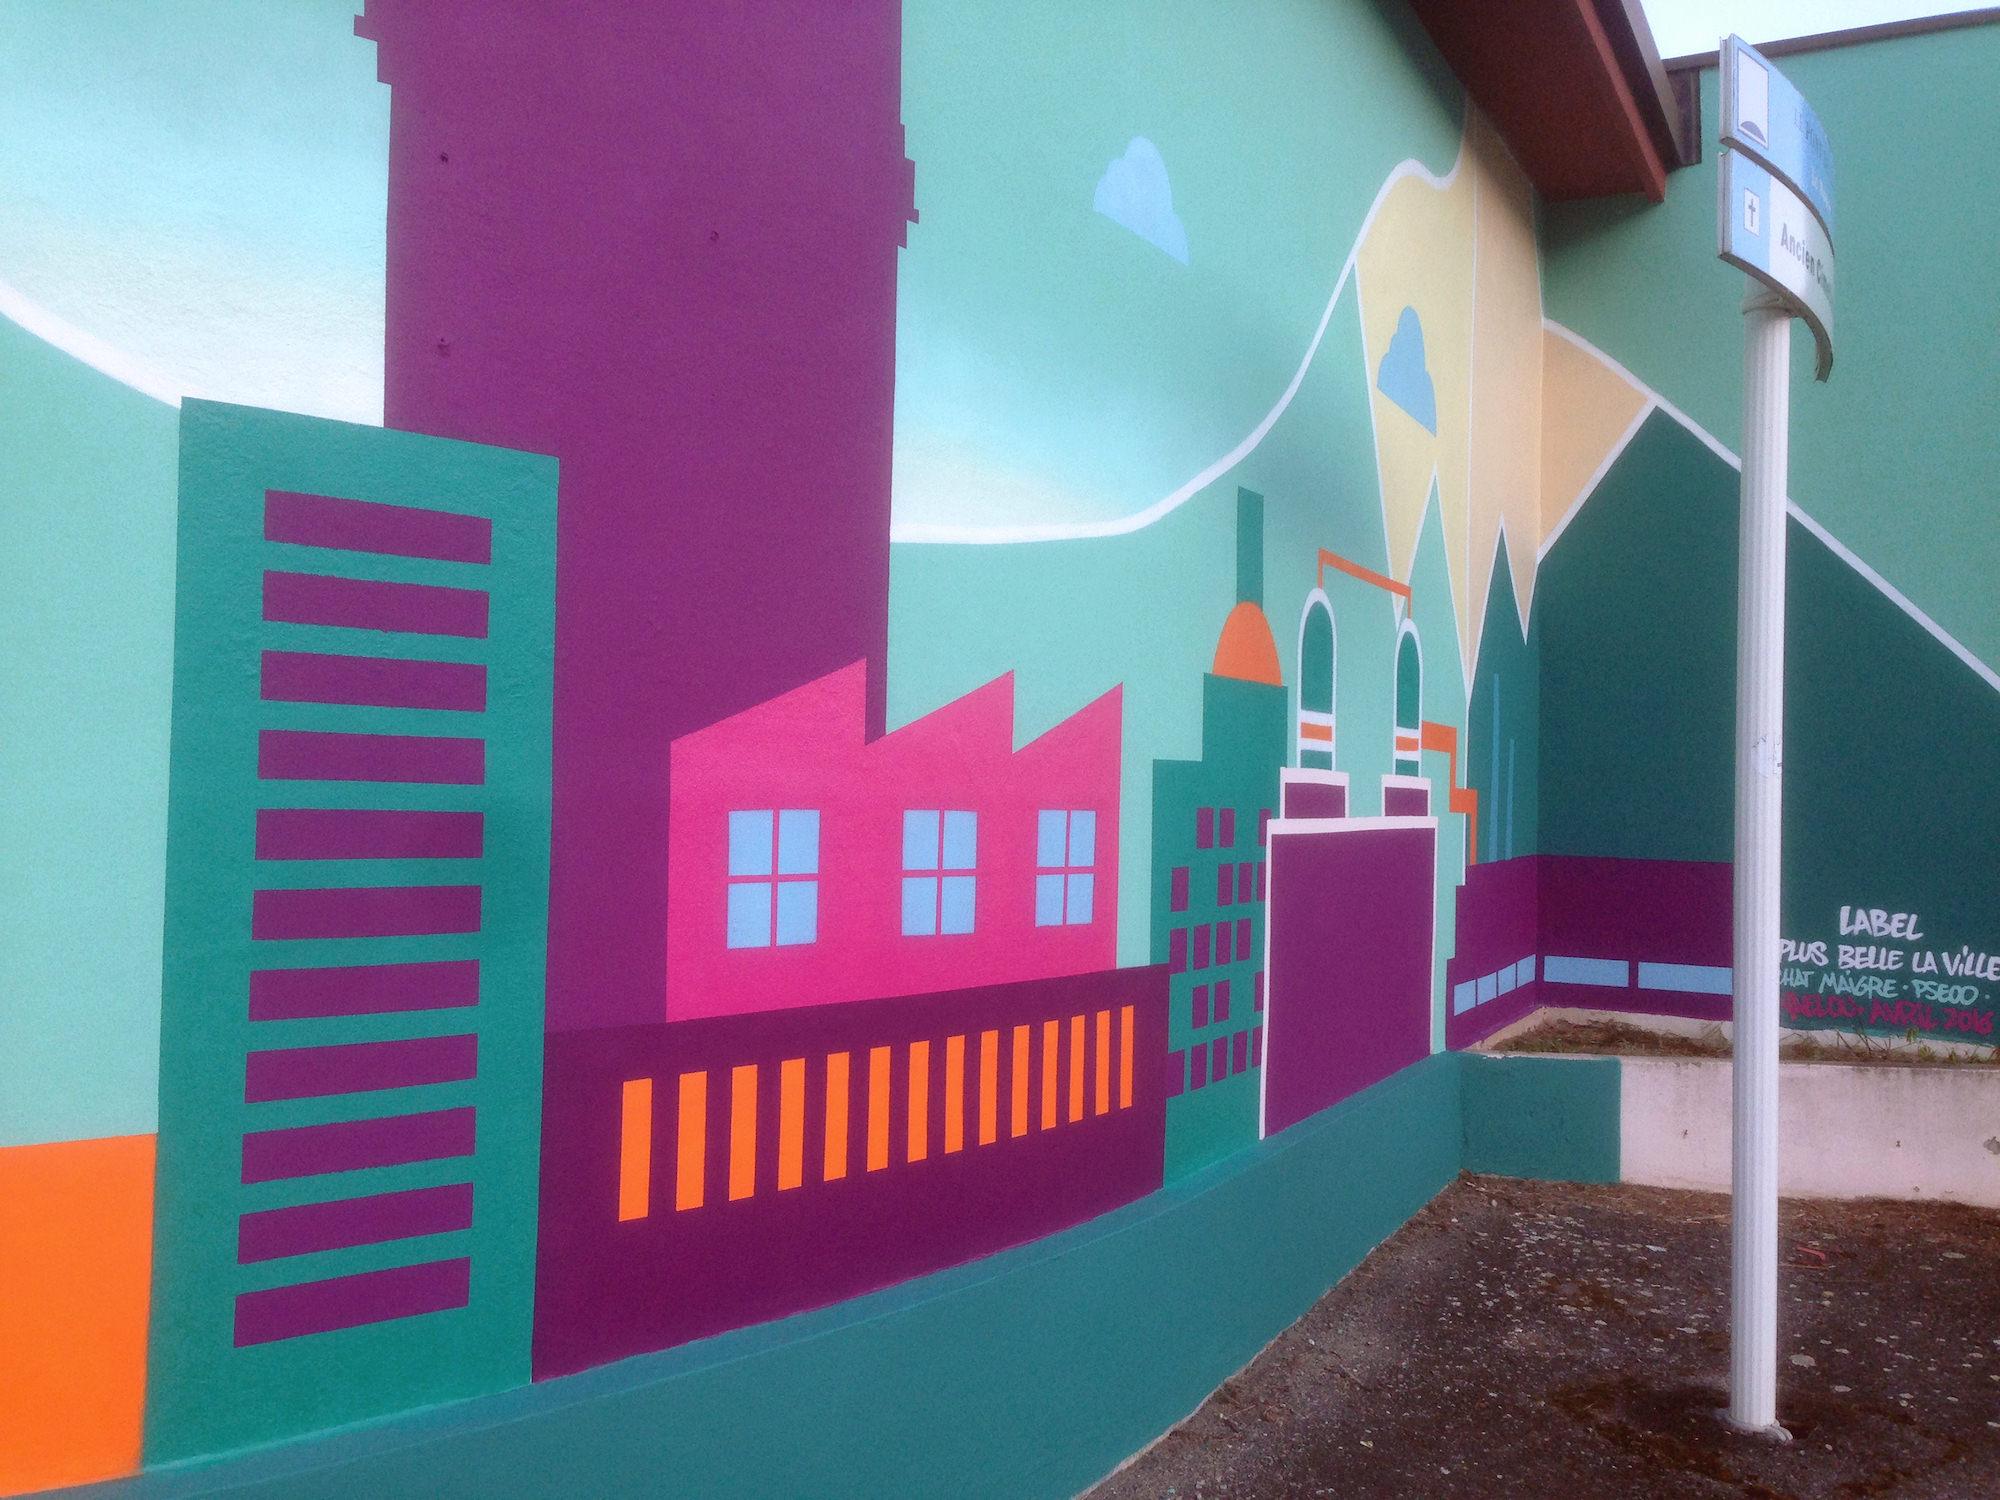 fresque-100ansdechimie-pontdeclaix